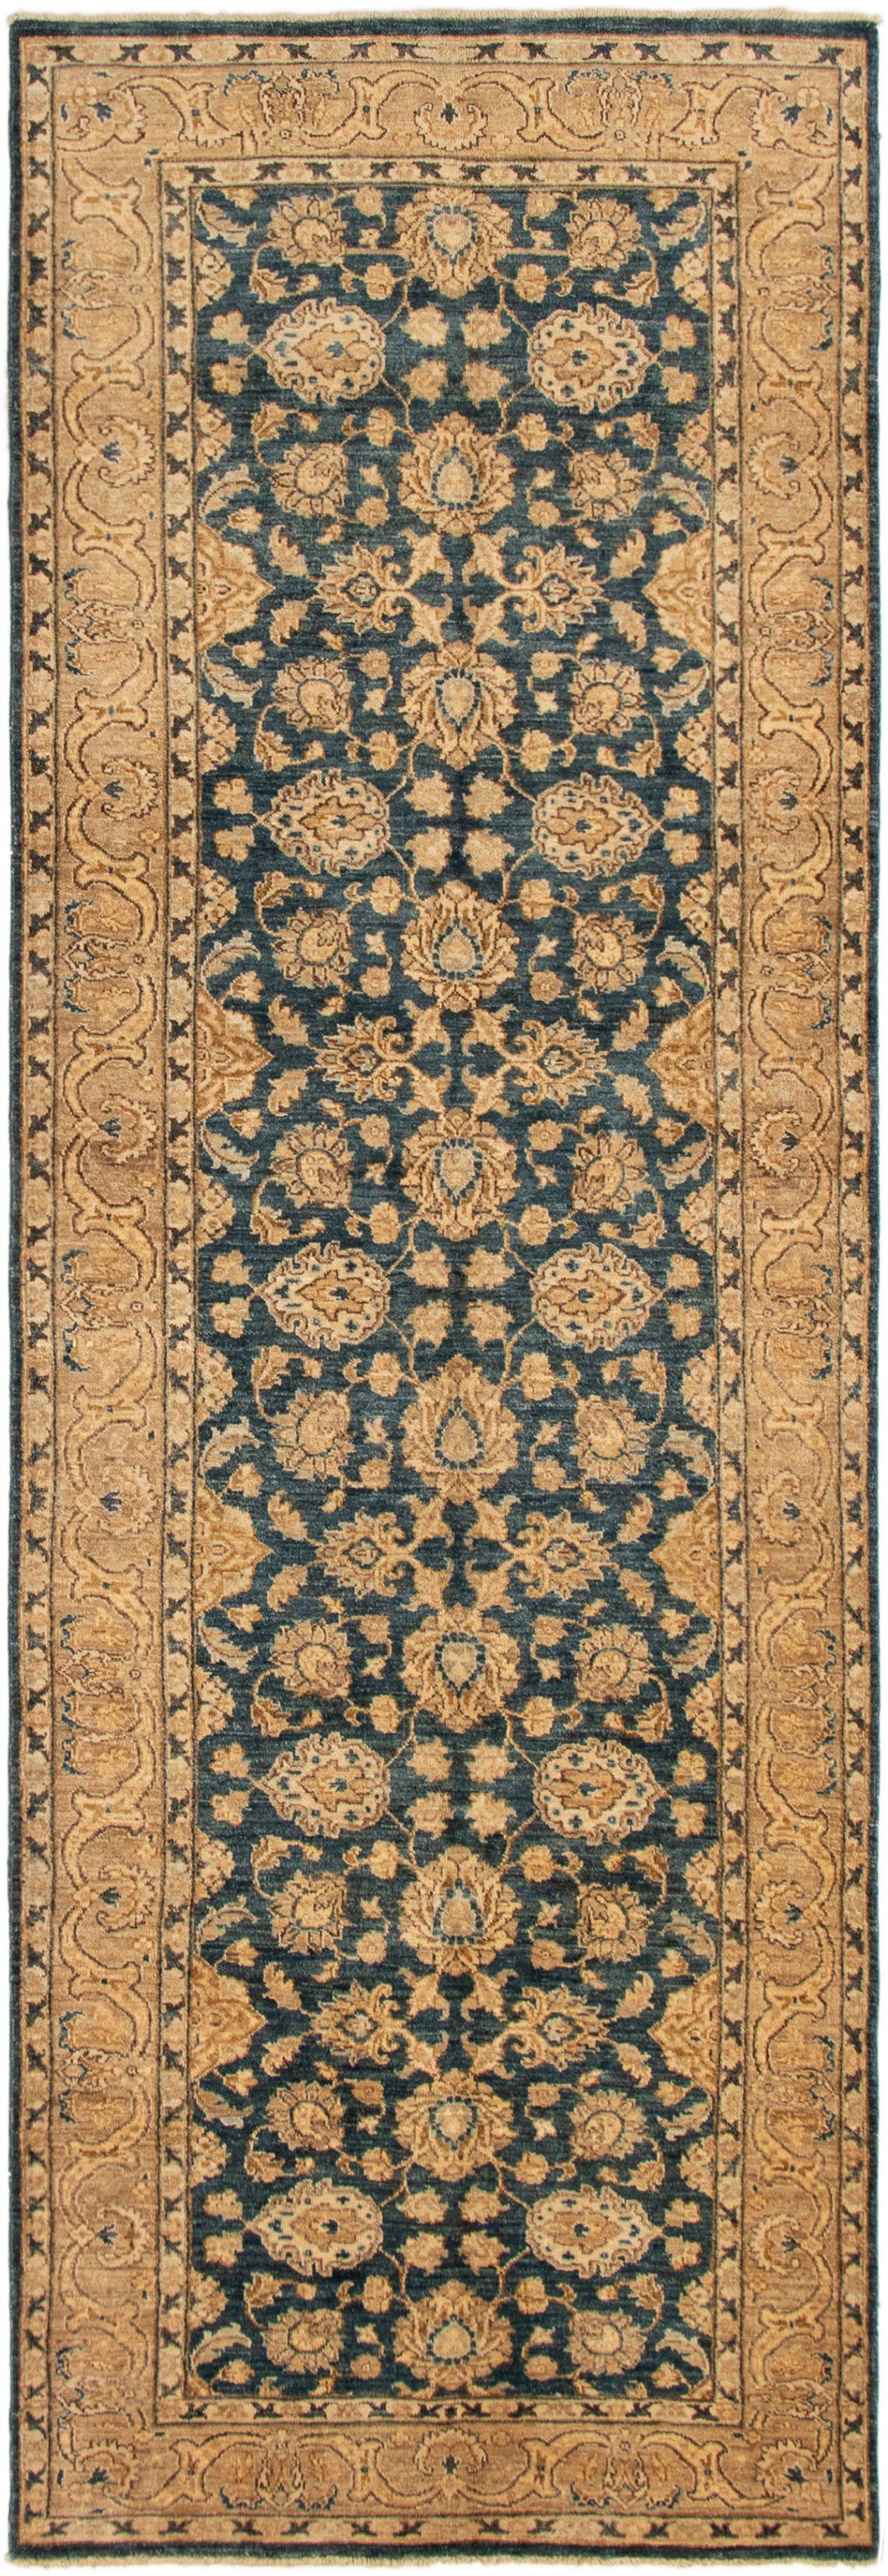 "Hand-knotted Peshawar Oushak Navy Blue Wool Rug 4'0"" x 12'3"" Size: 4'0"" x 12'3"""